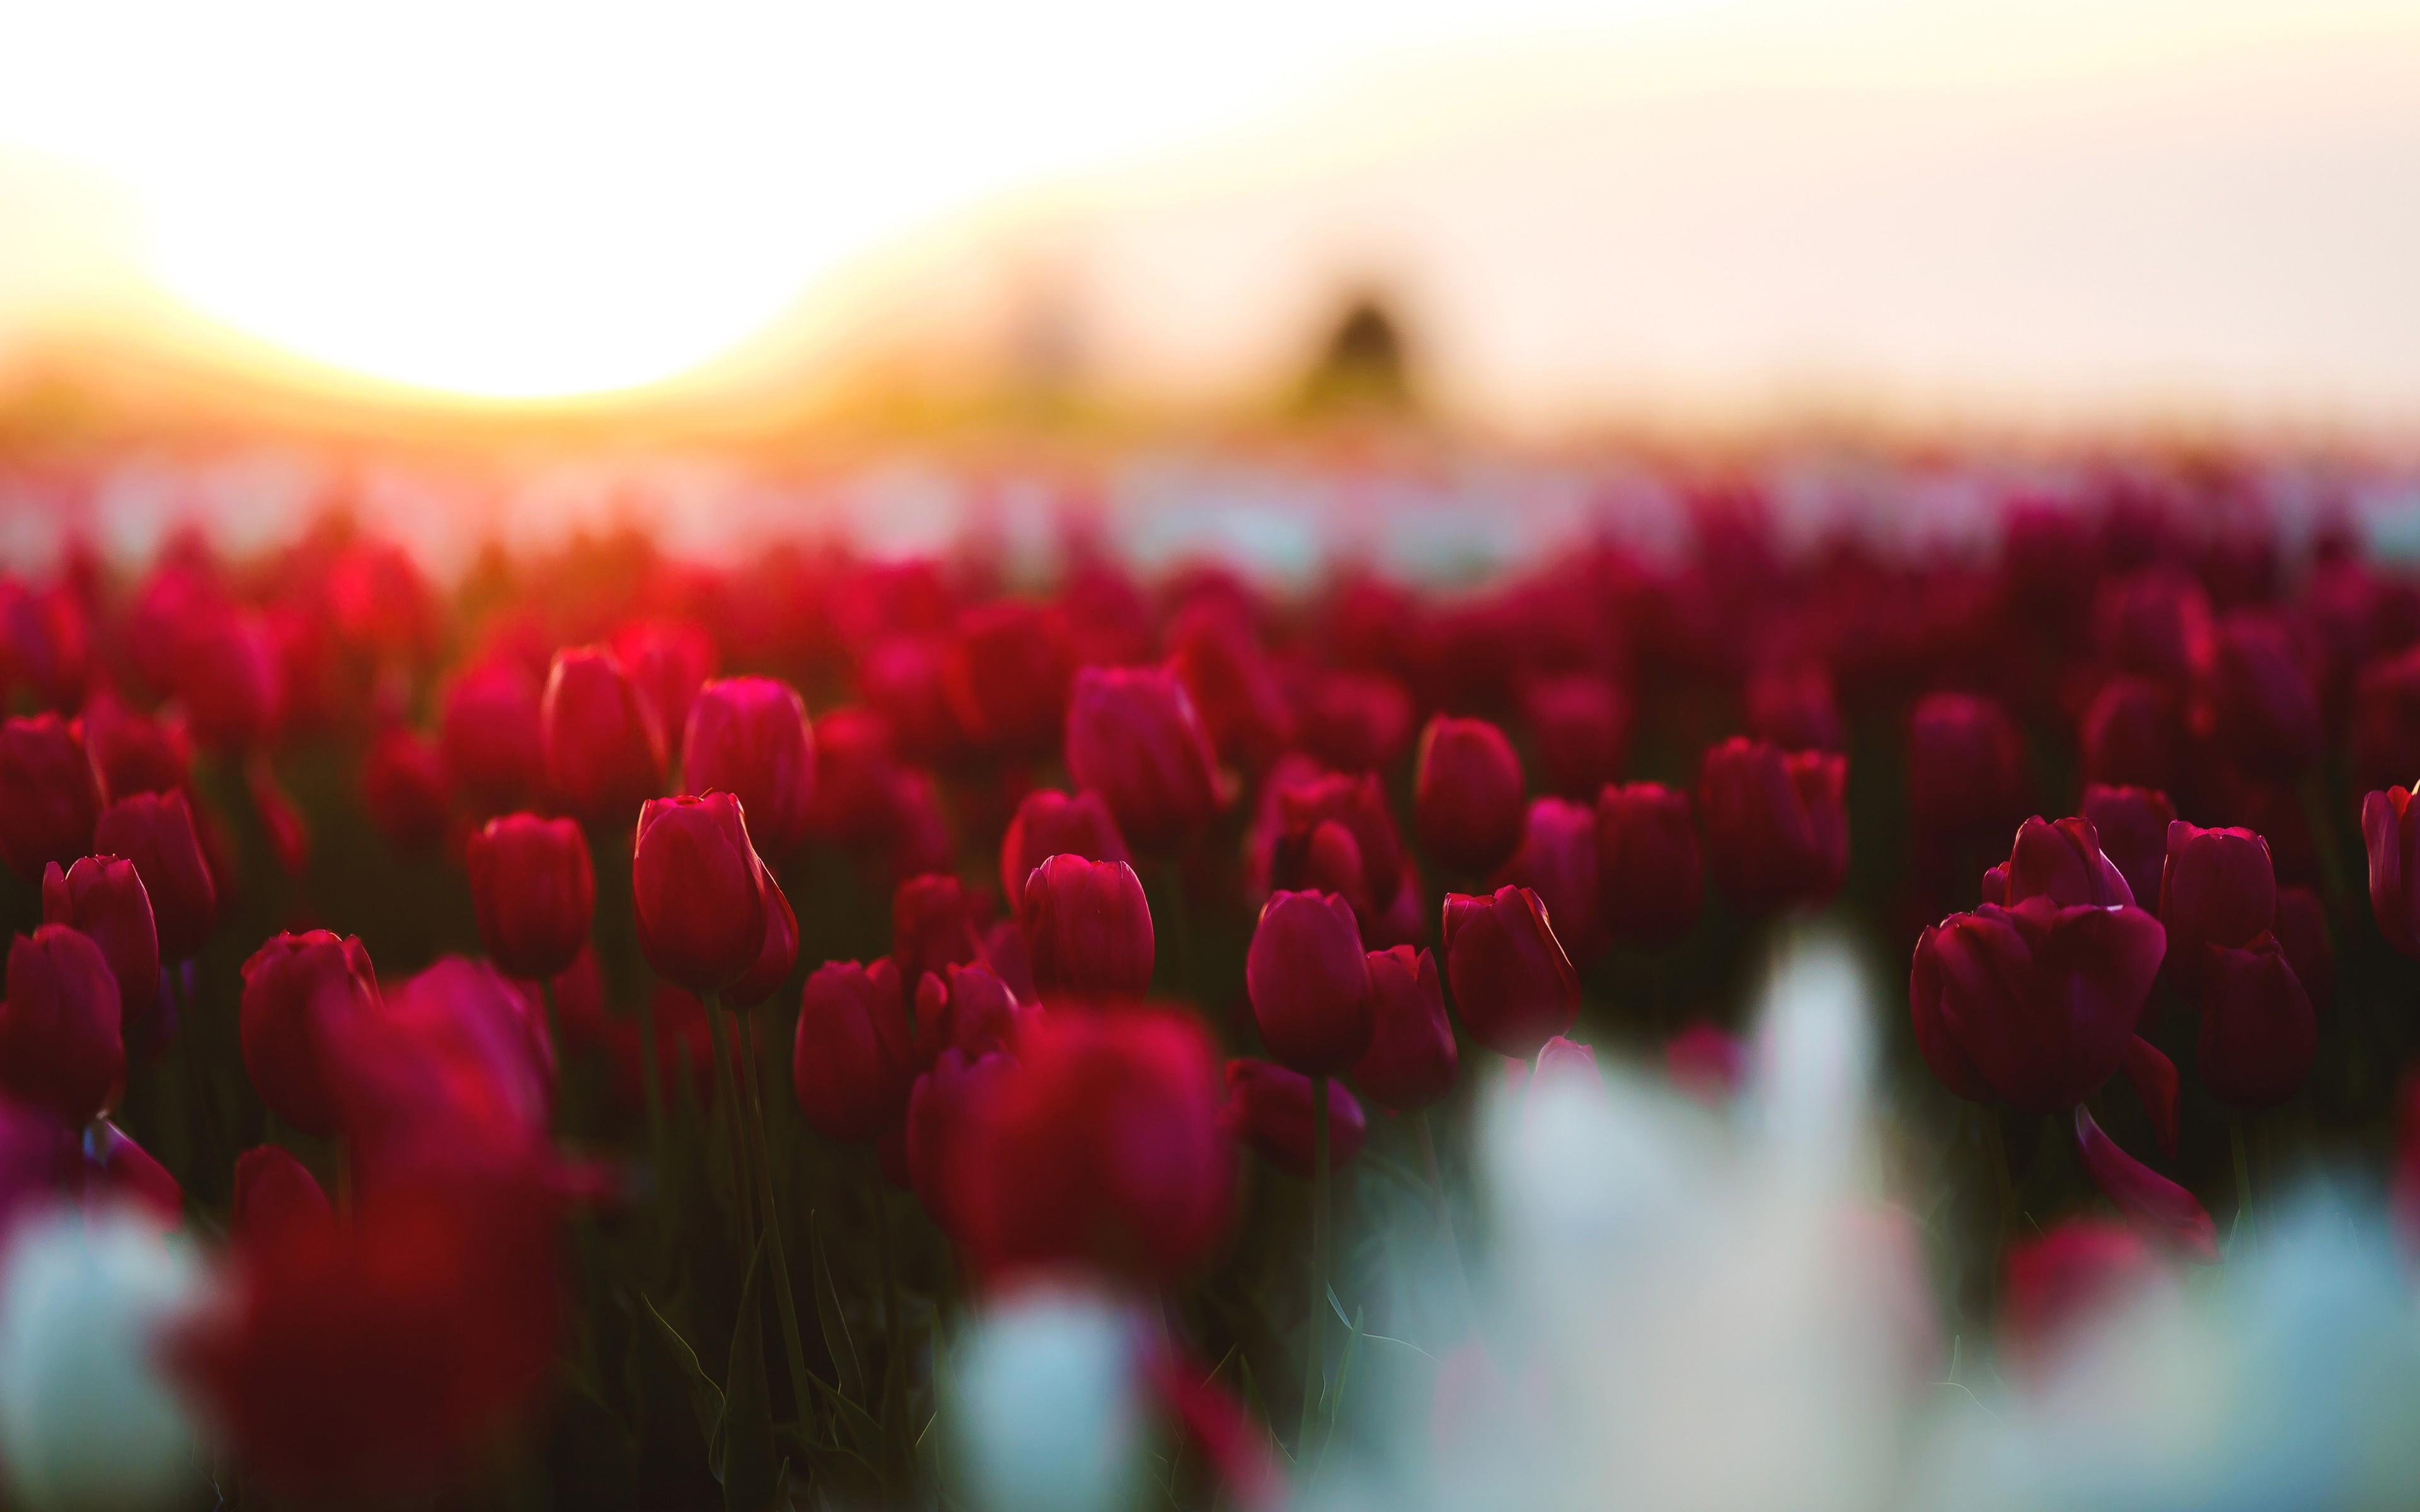 Wallpaper Hd 1080p 3d Flower Tulips Garden 4k Wallpapers Hd Wallpapers Id 22803